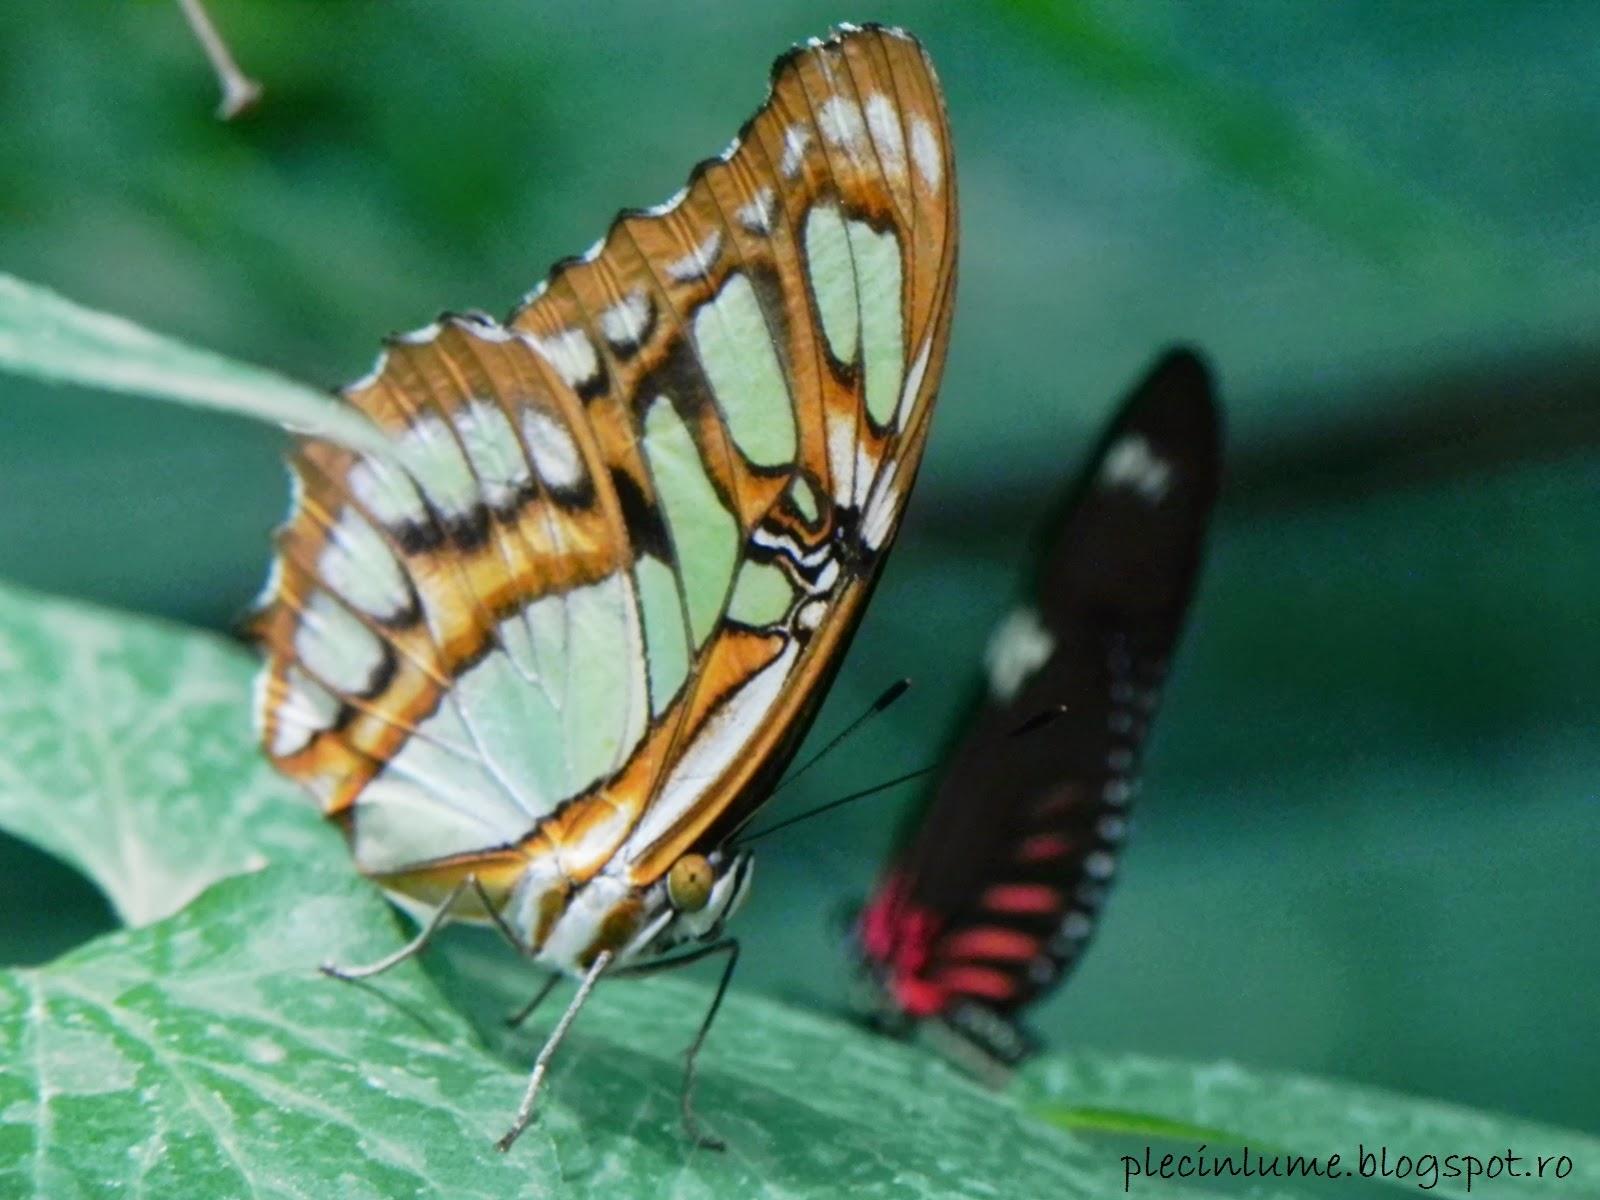 Fluture in prim plan